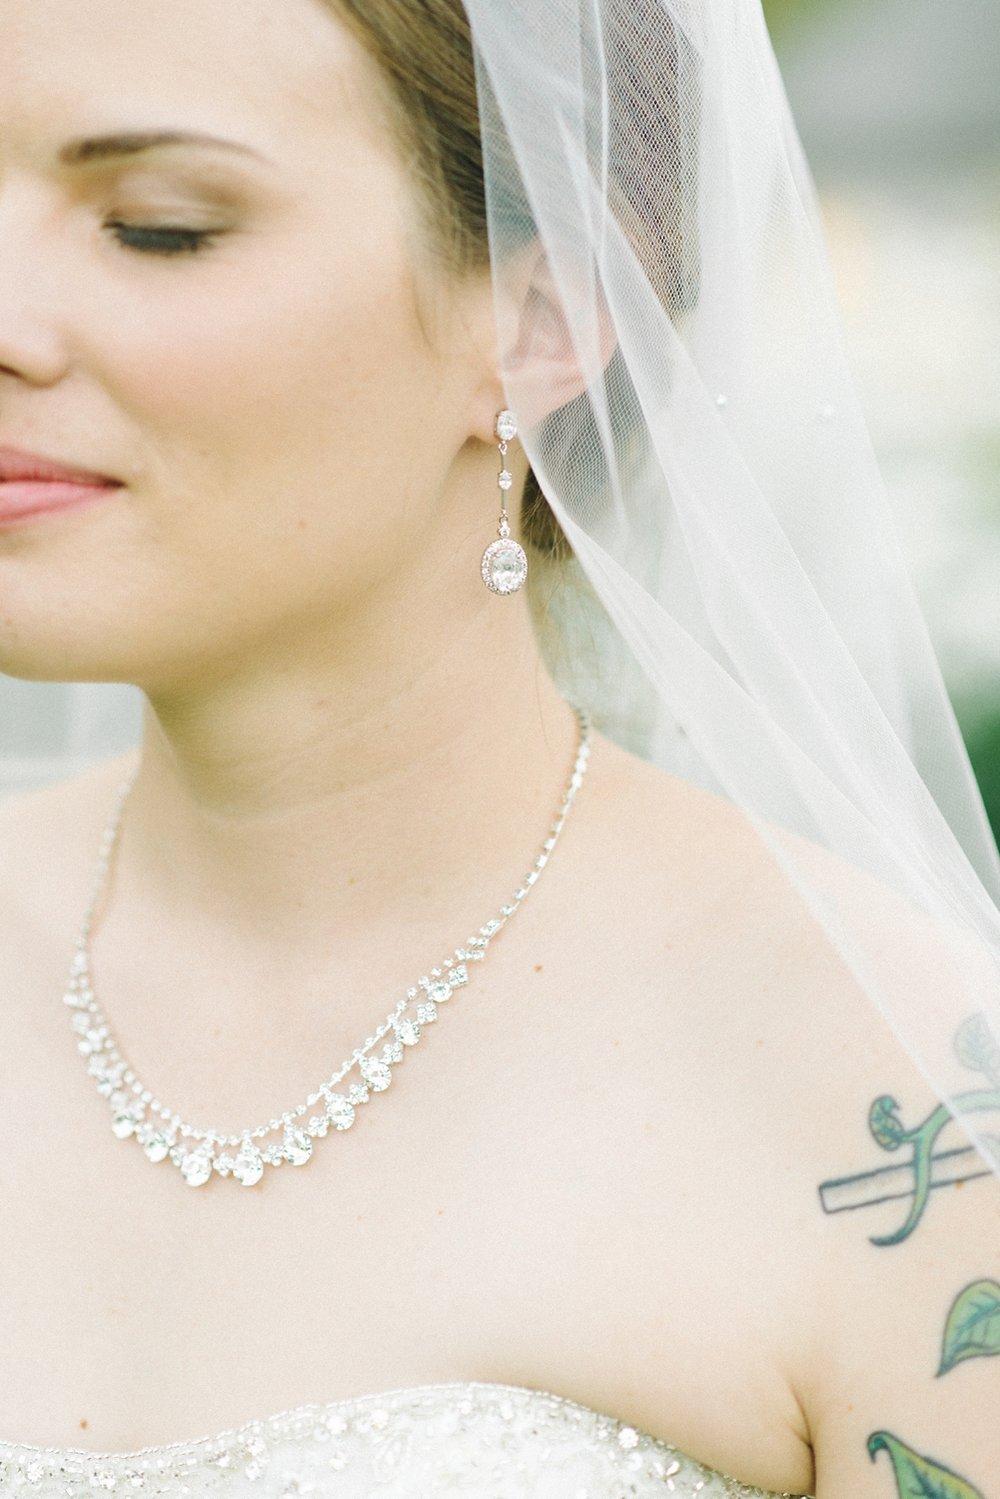 mcmenamins-edgefield-bride-wedding-bridal-portrait-shelley-marie-photo-2.jpg